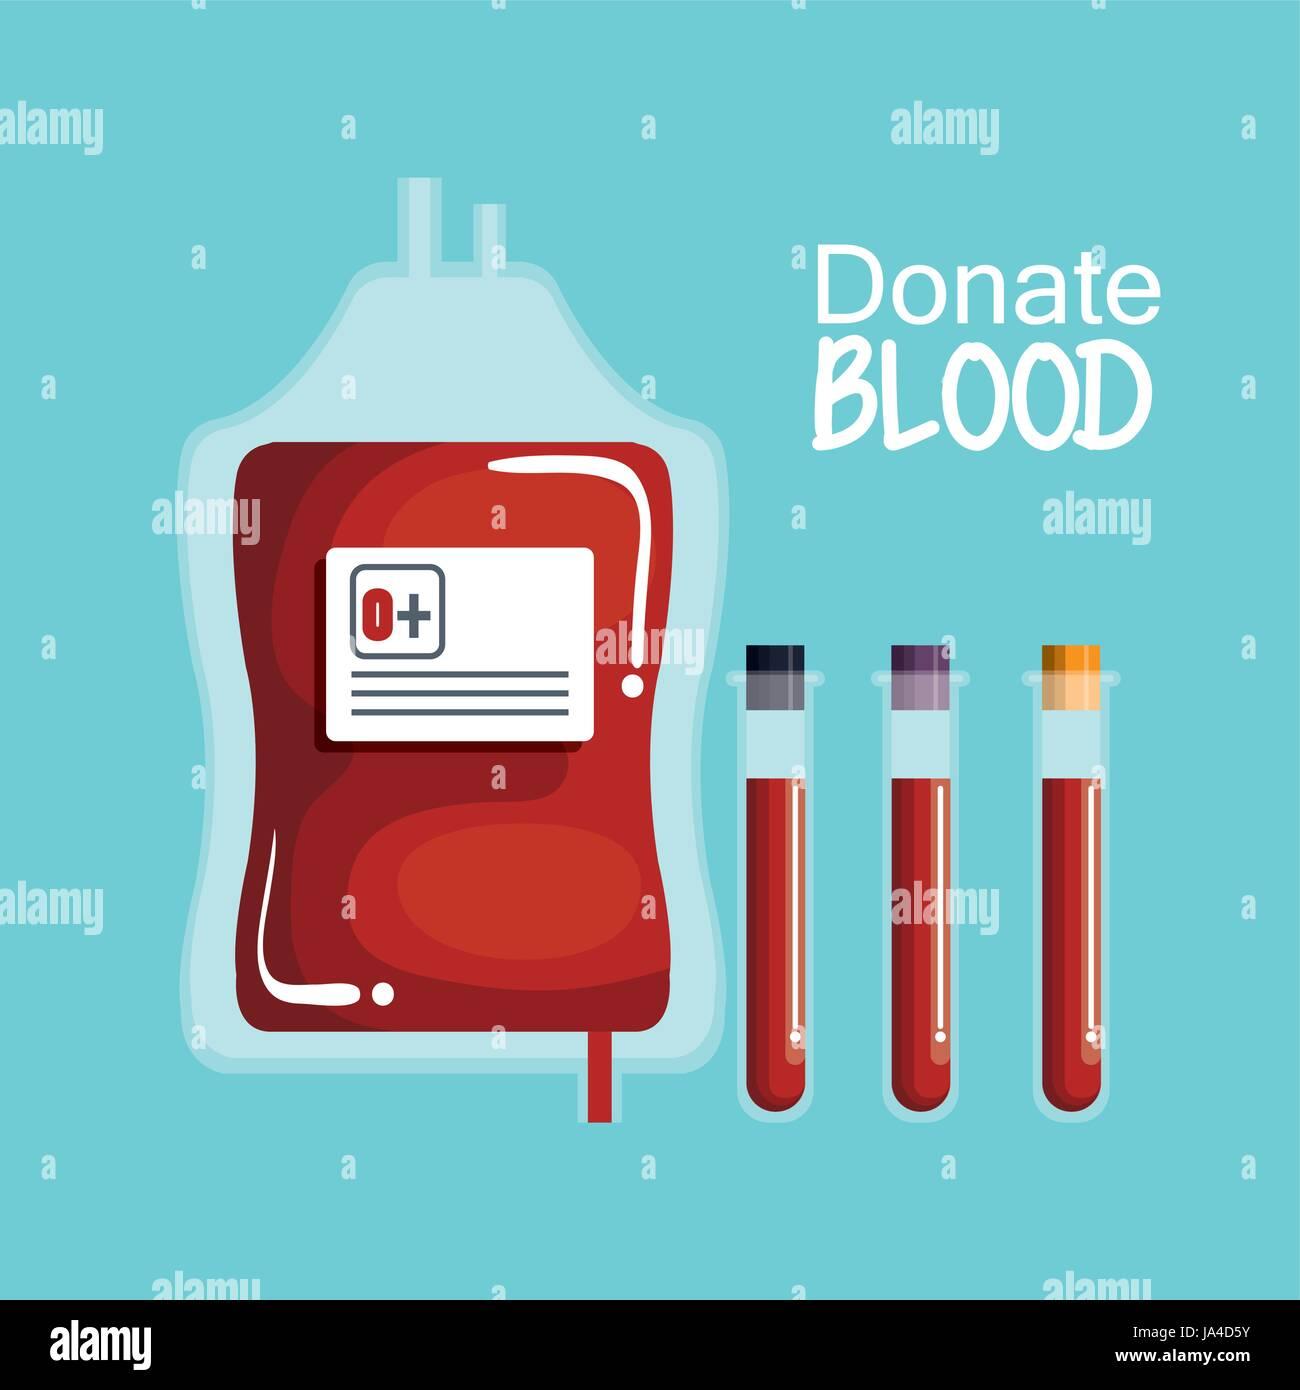 Donating blood design - Stock Vector